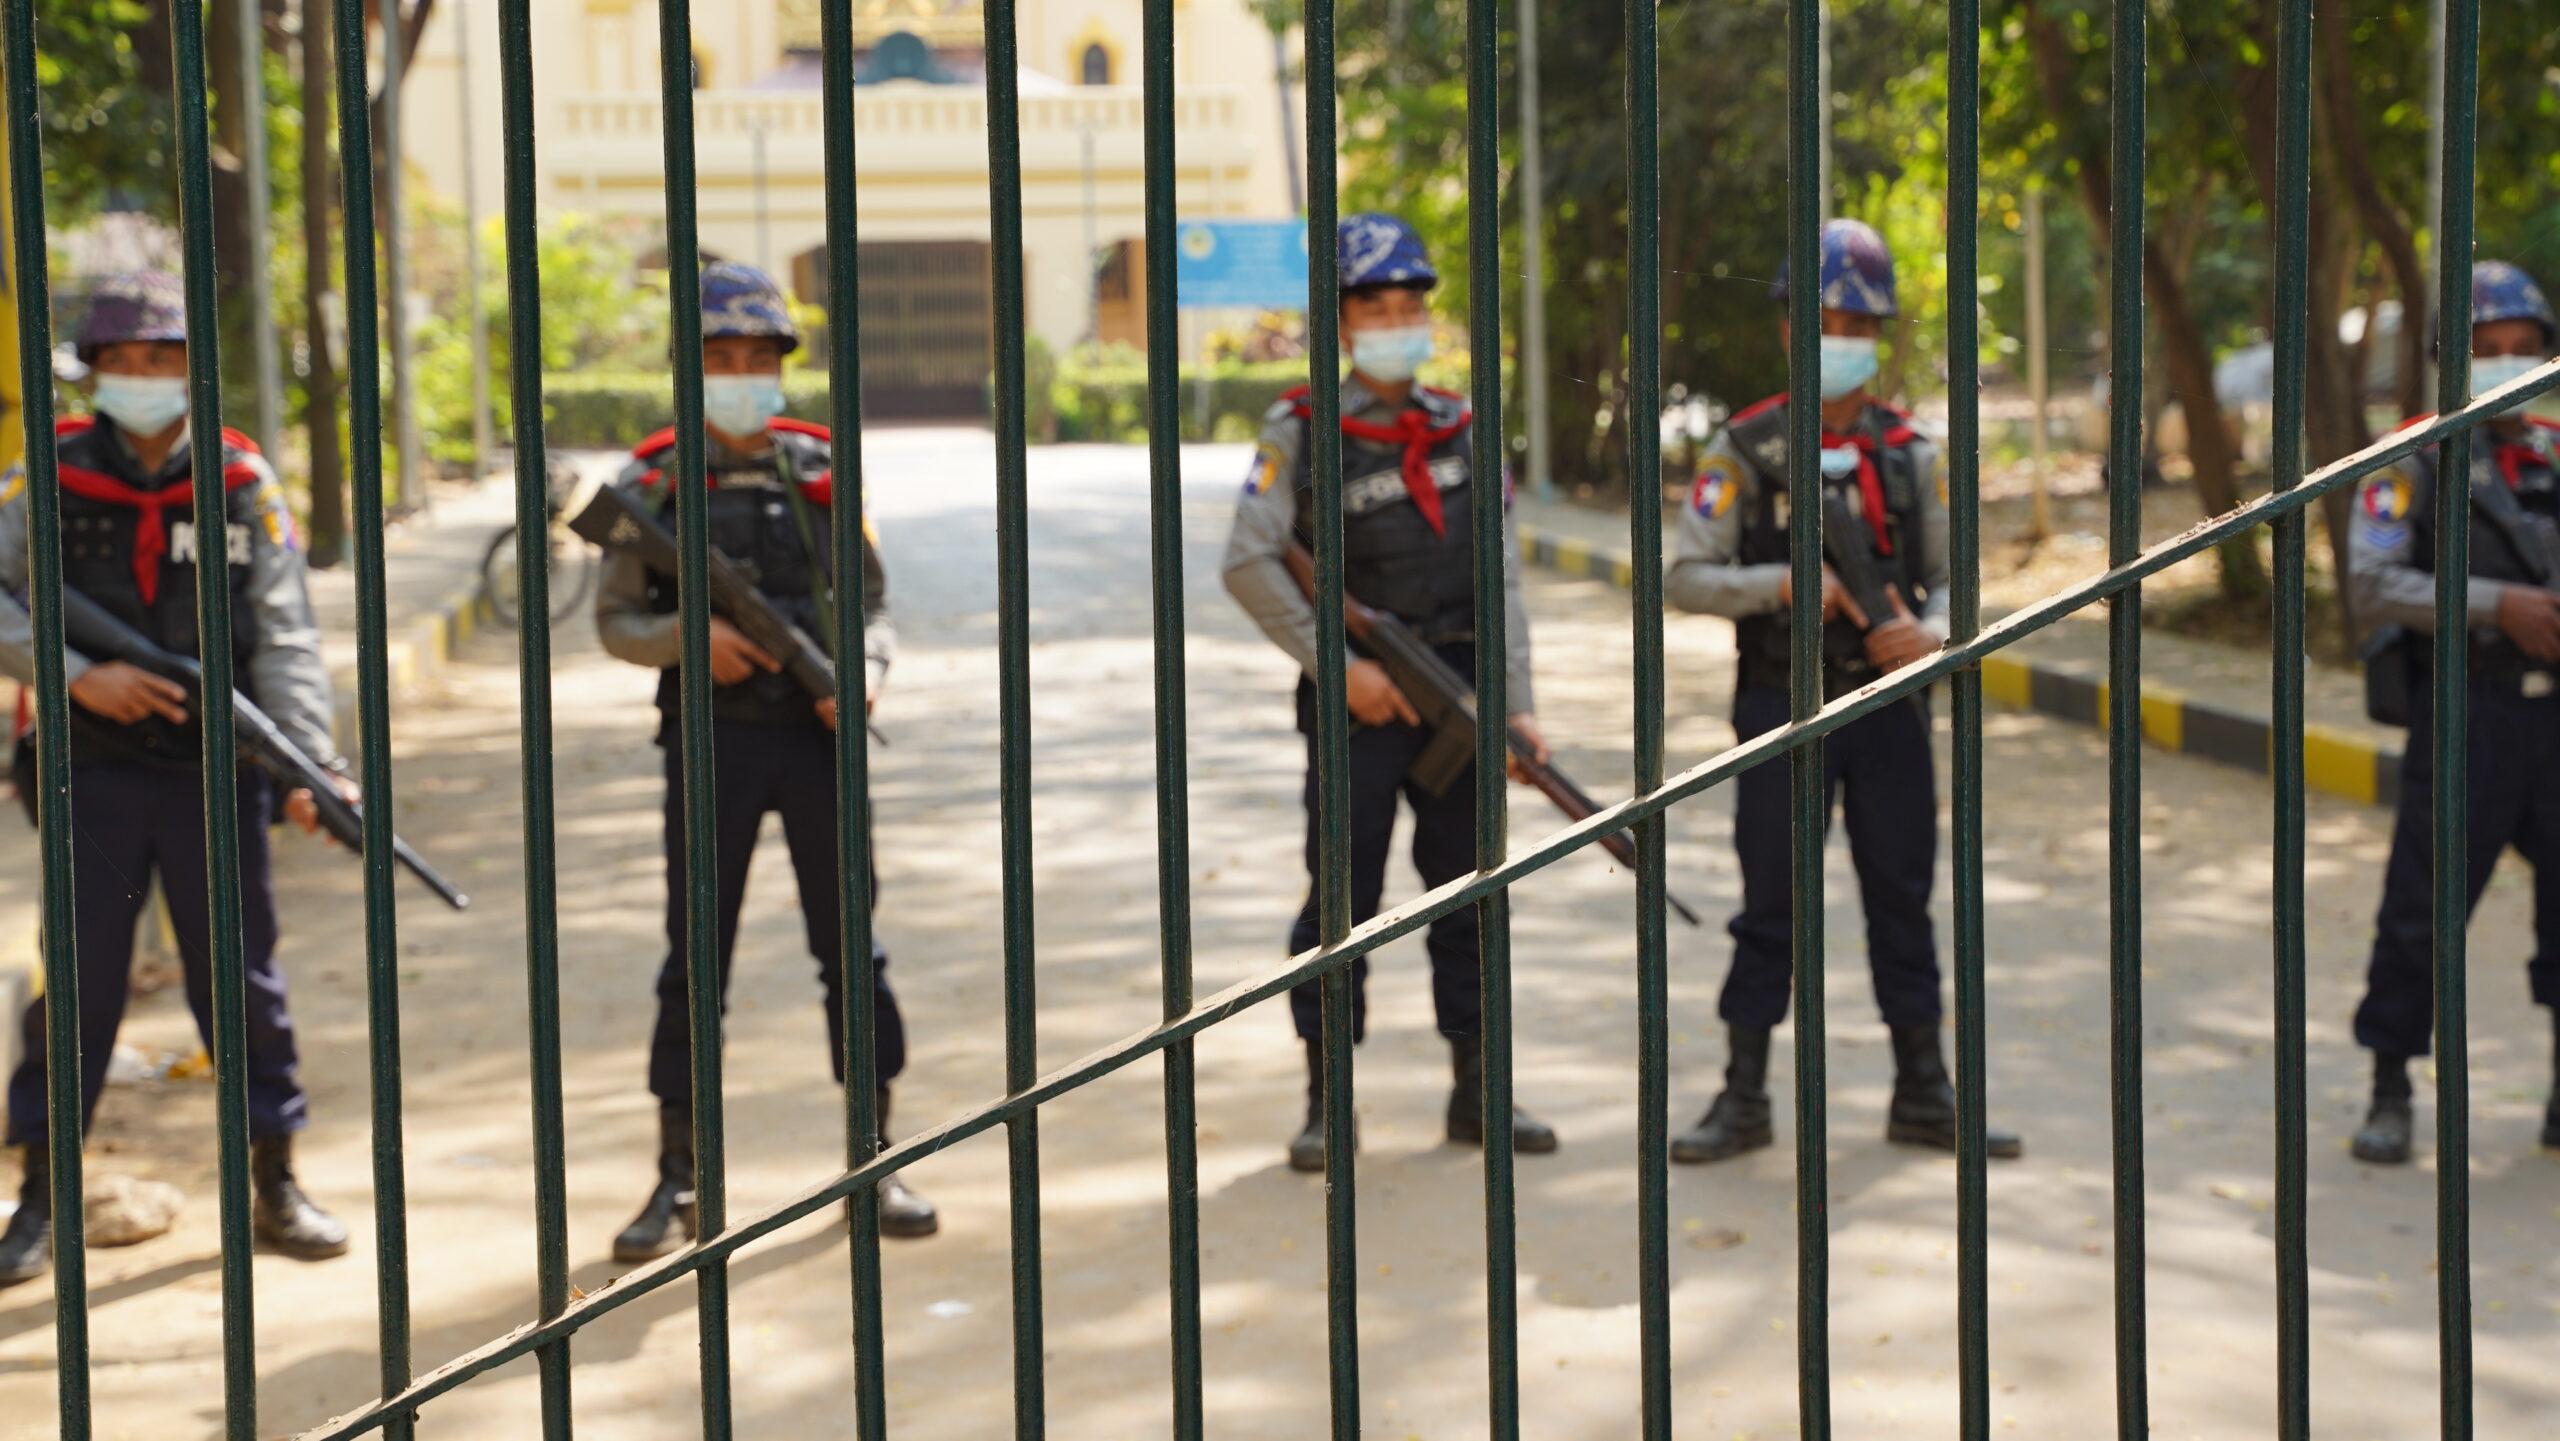 Myanmar: UN Security Council must urgently impose arms embargo